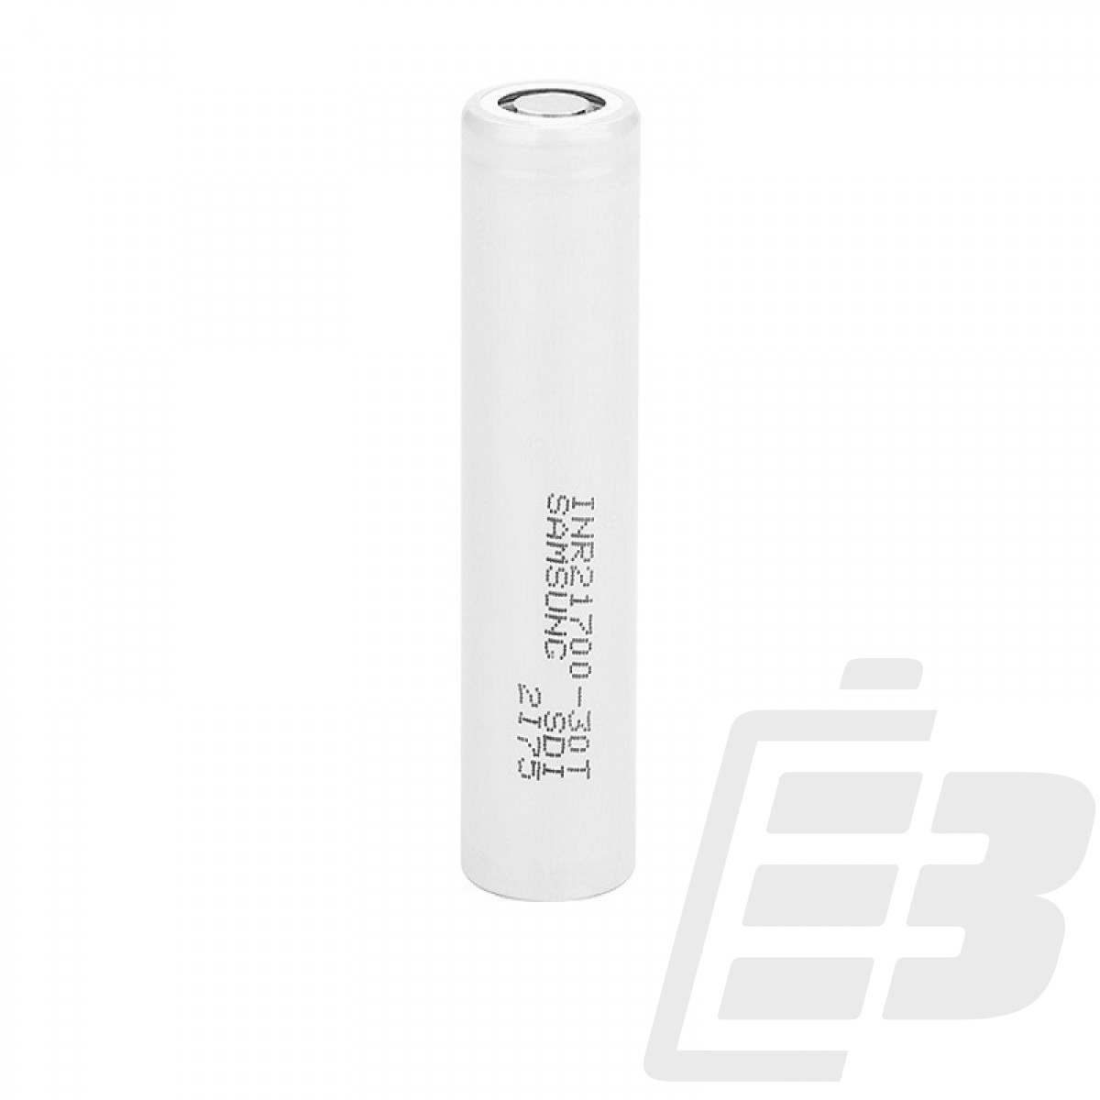 Samsung INR 21700 30T battery 3000mAh 35A